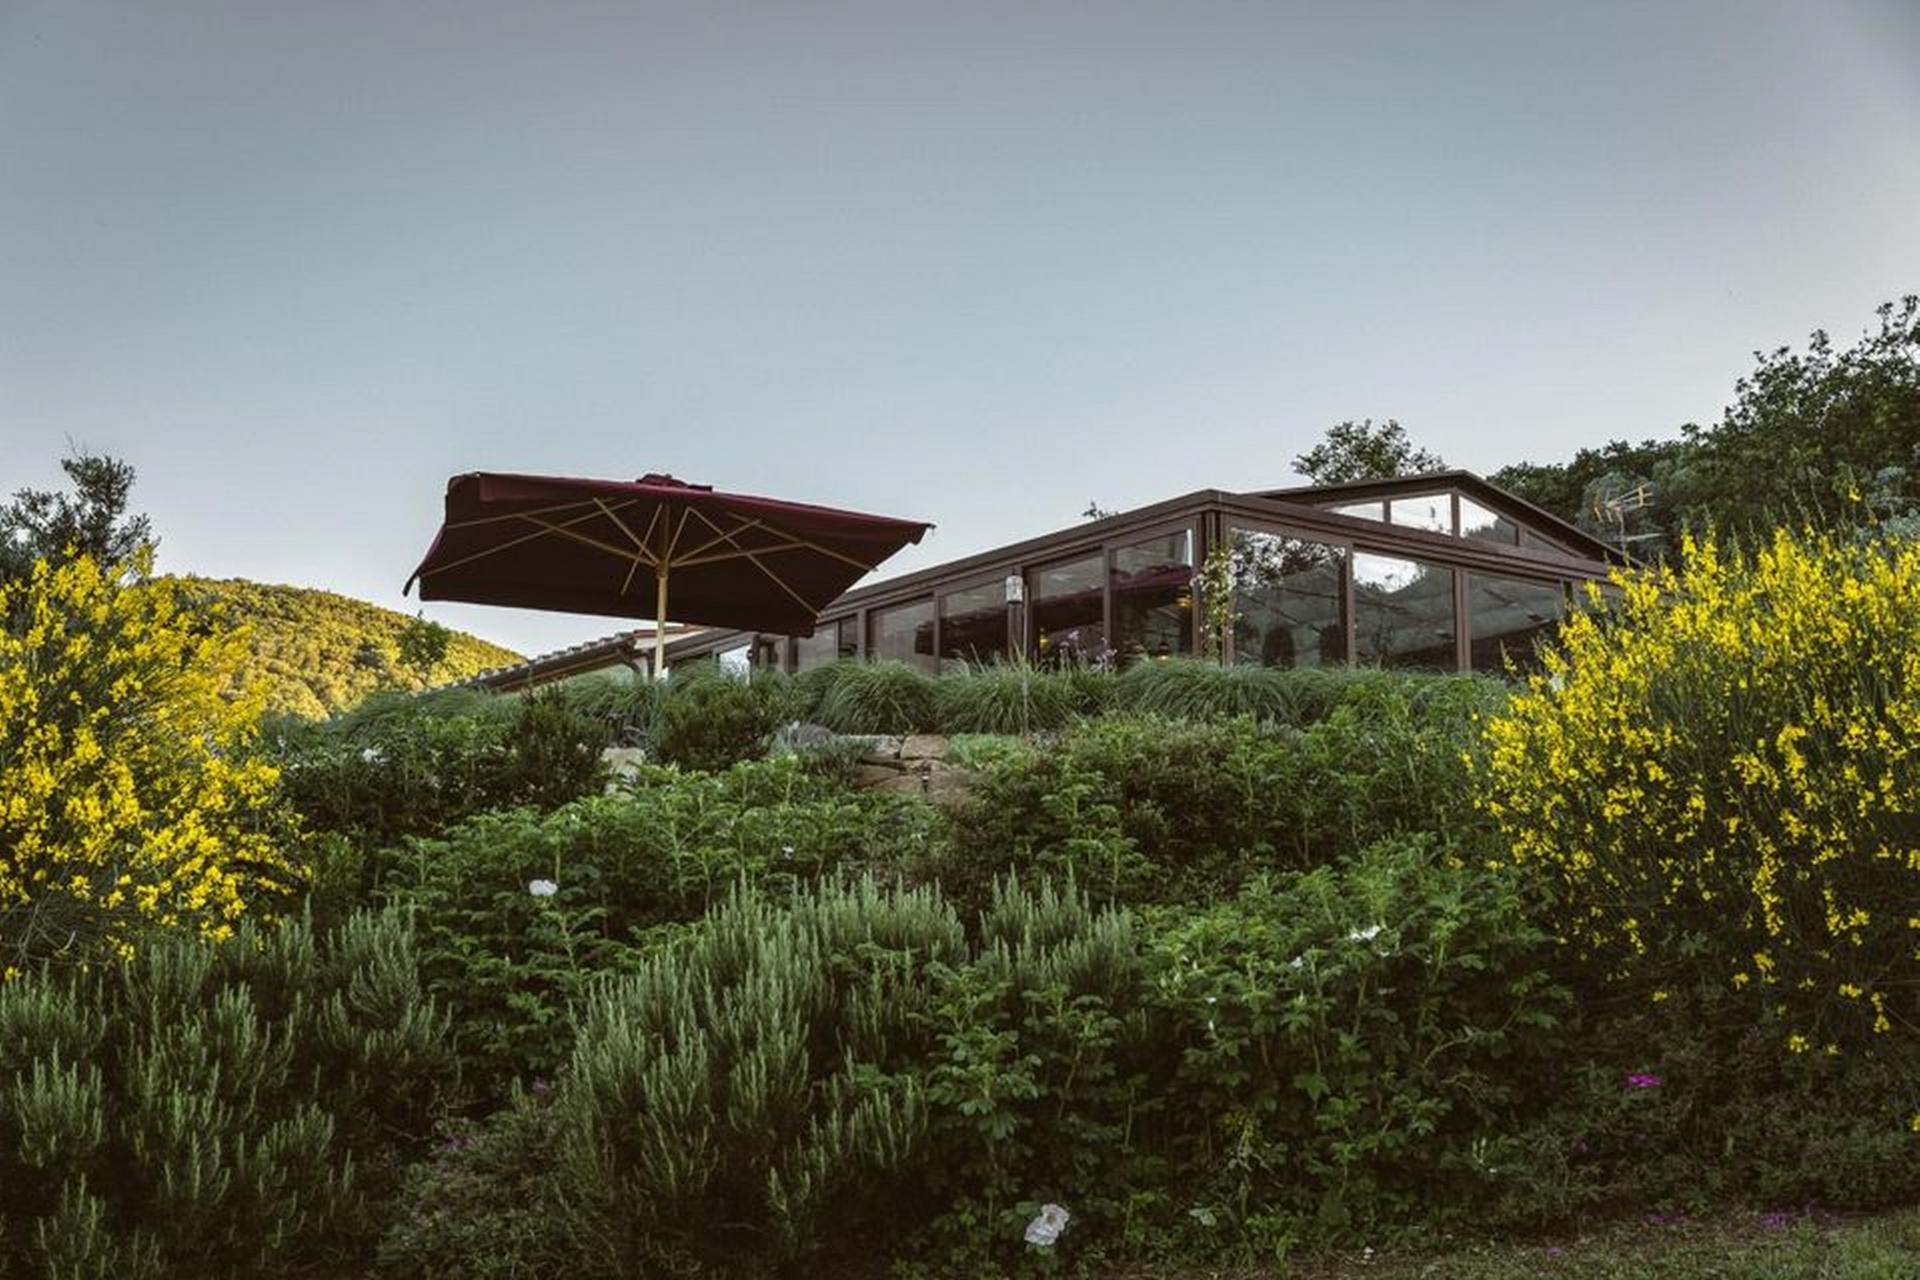 Agriturismo Toskana Großer Agriturismo in der Toskana mit atemberaubendem Blick